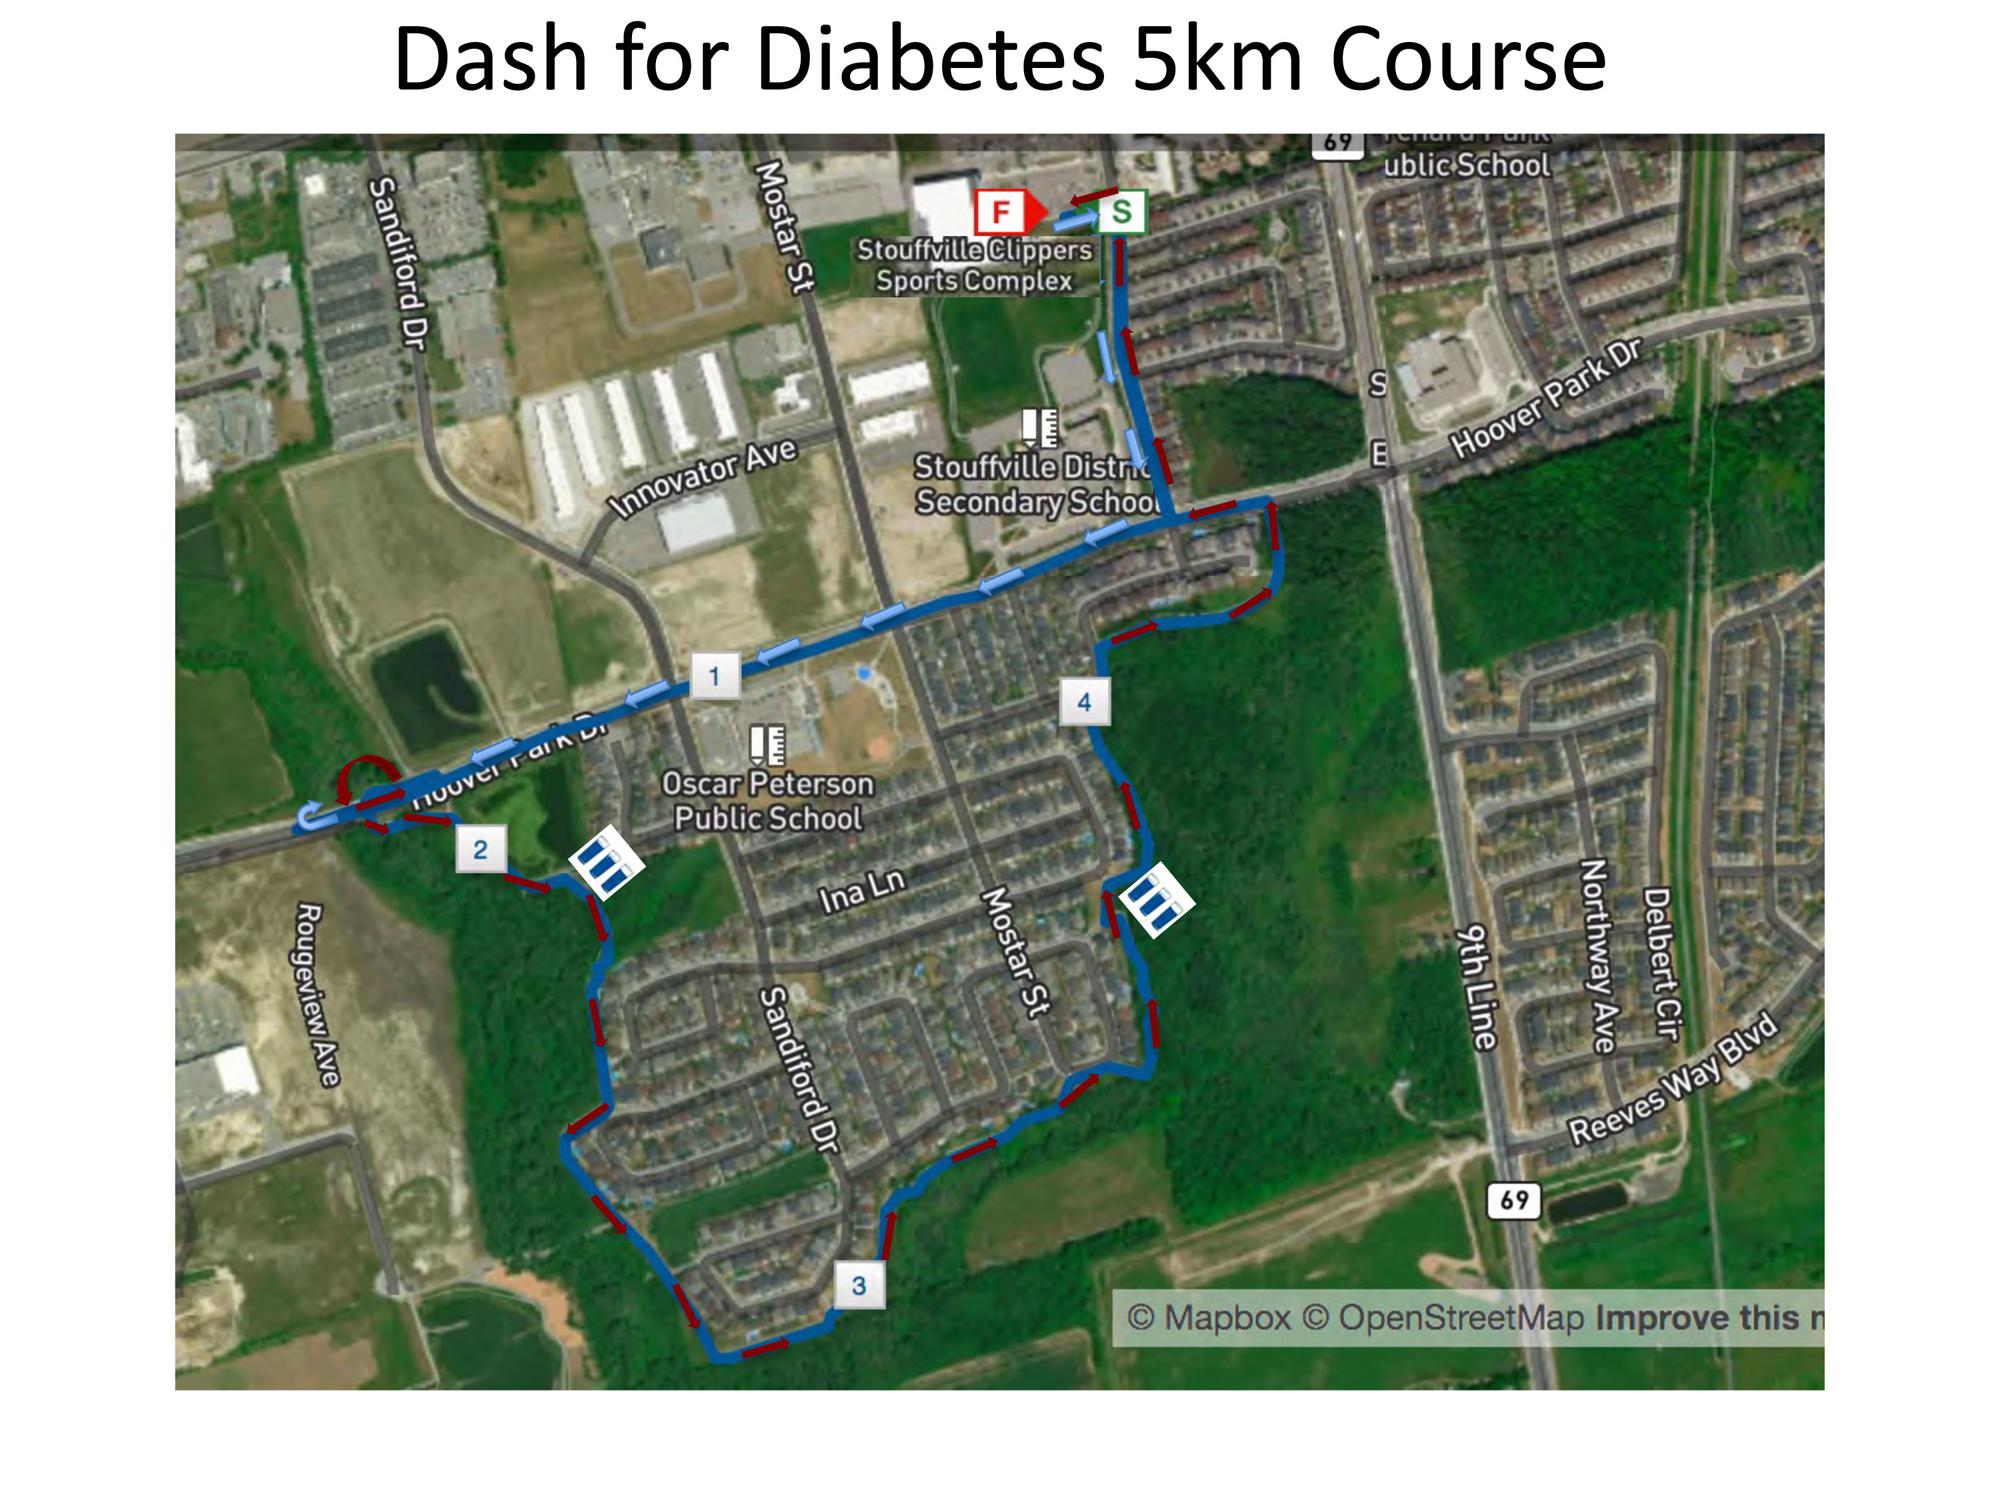 2019 Dashfor Diabetes5 KMap